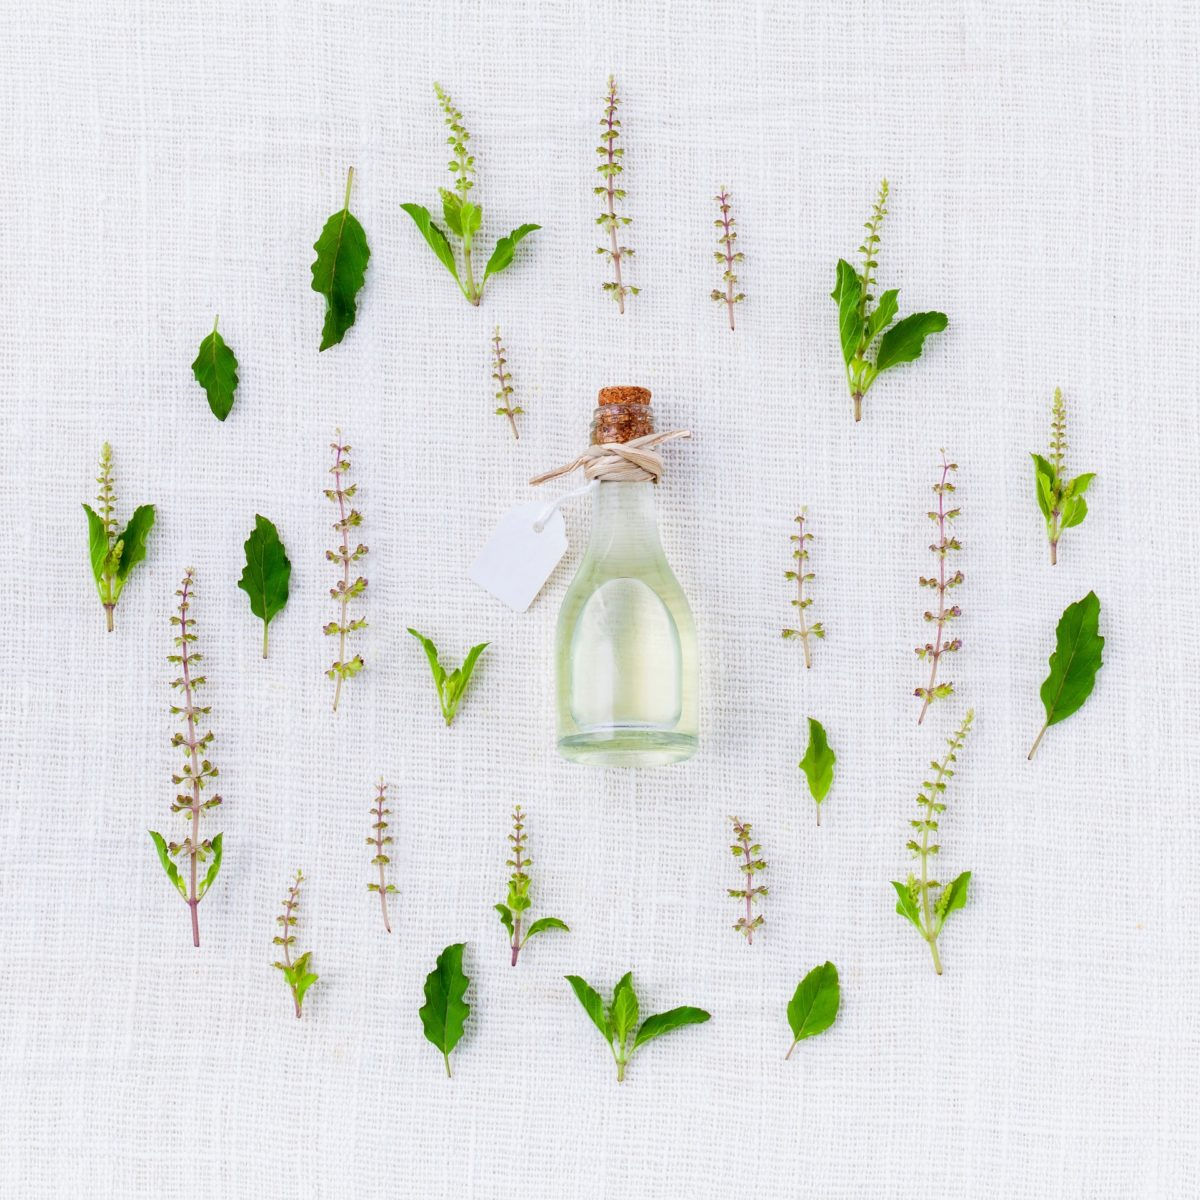 huile essentielle bio pixabay